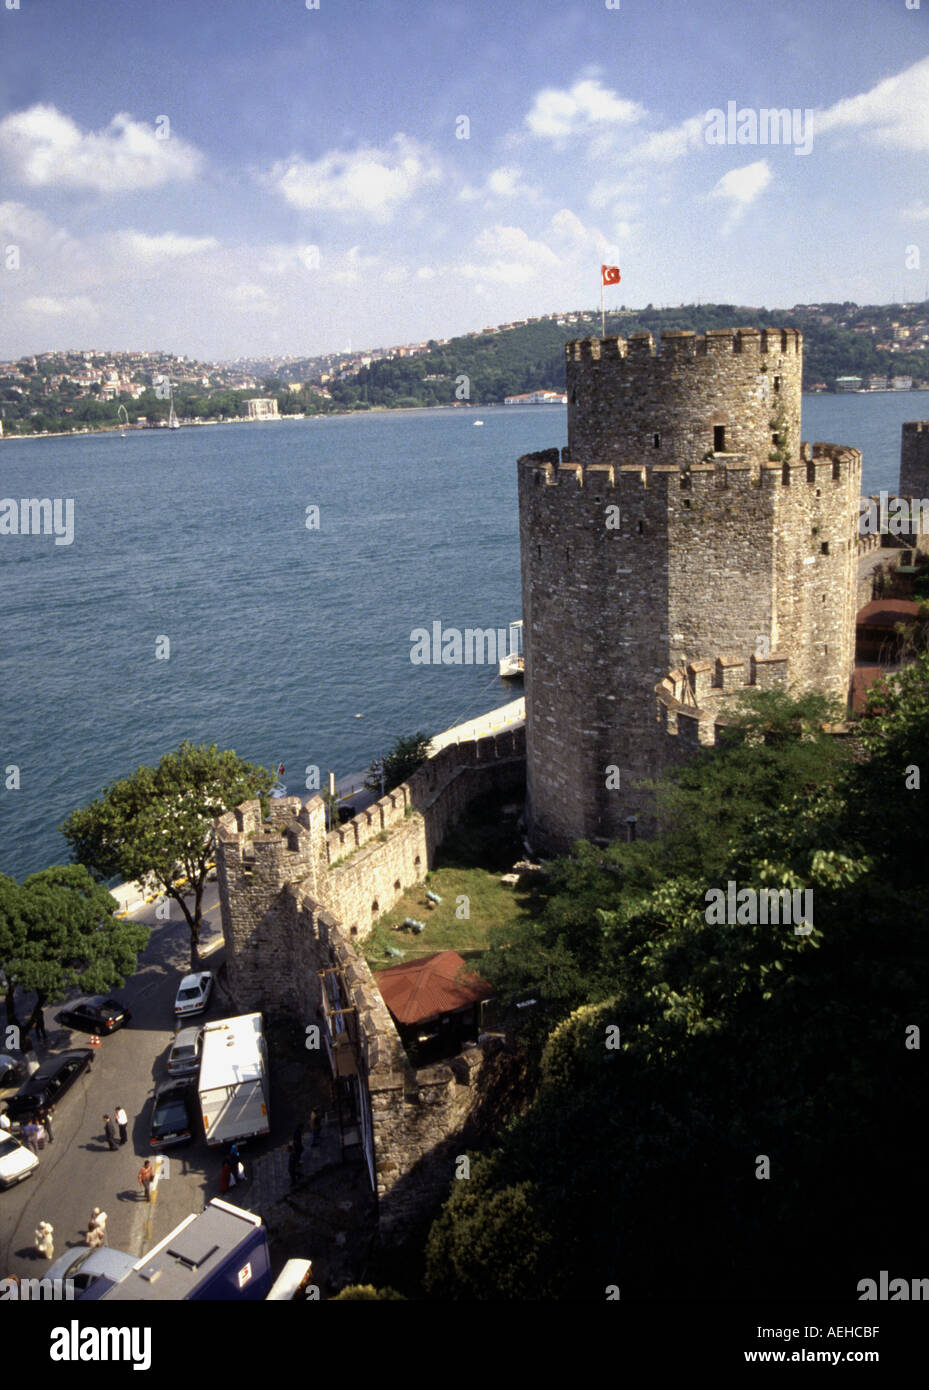 Bosphorus Rumeli hisari /istanbul Stock Photo